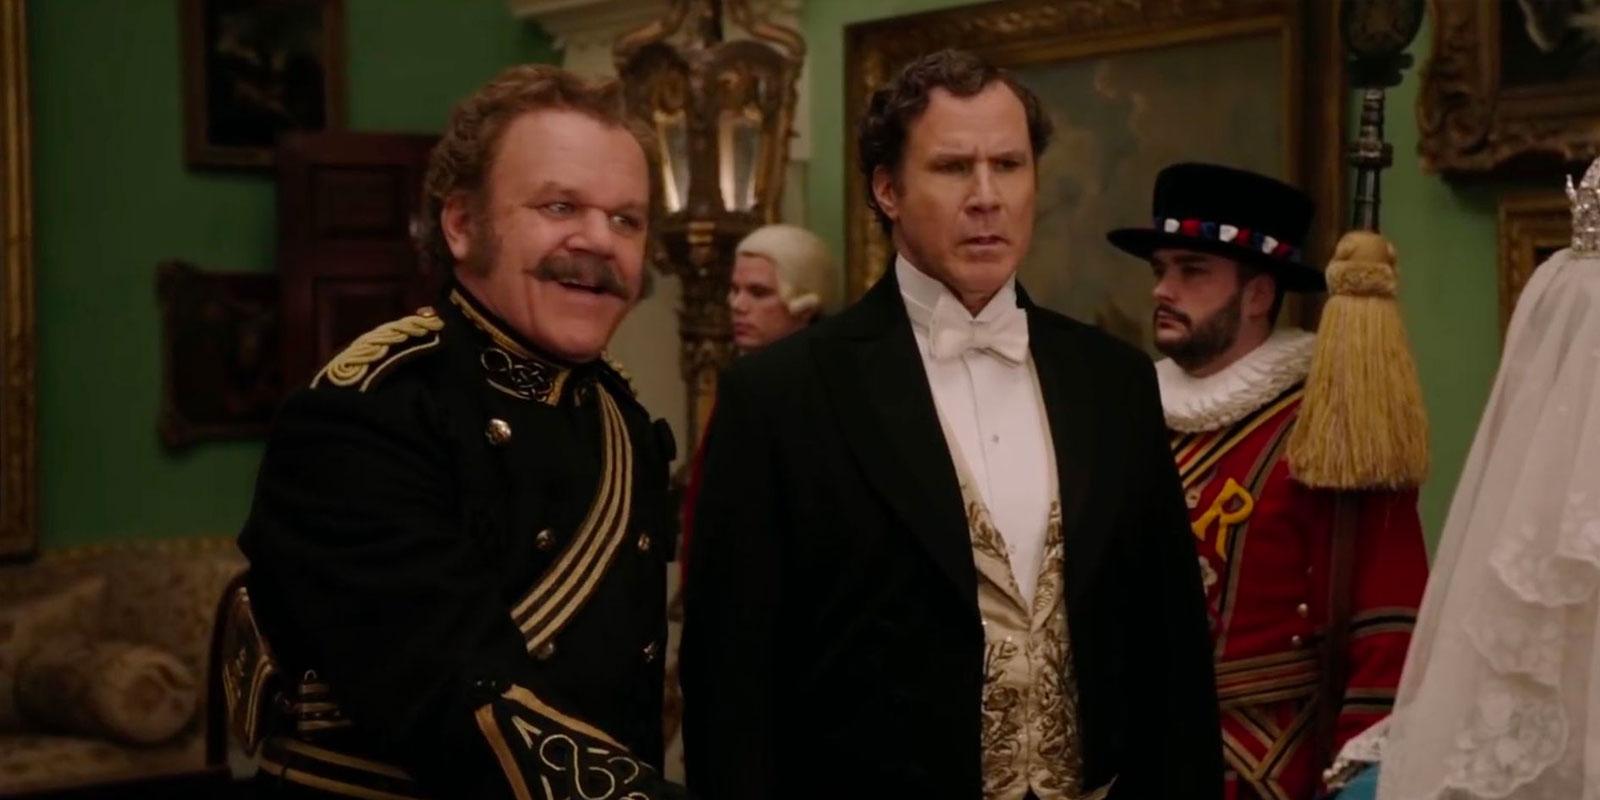 Кадры из фильма Холмс & Ватсон 2019